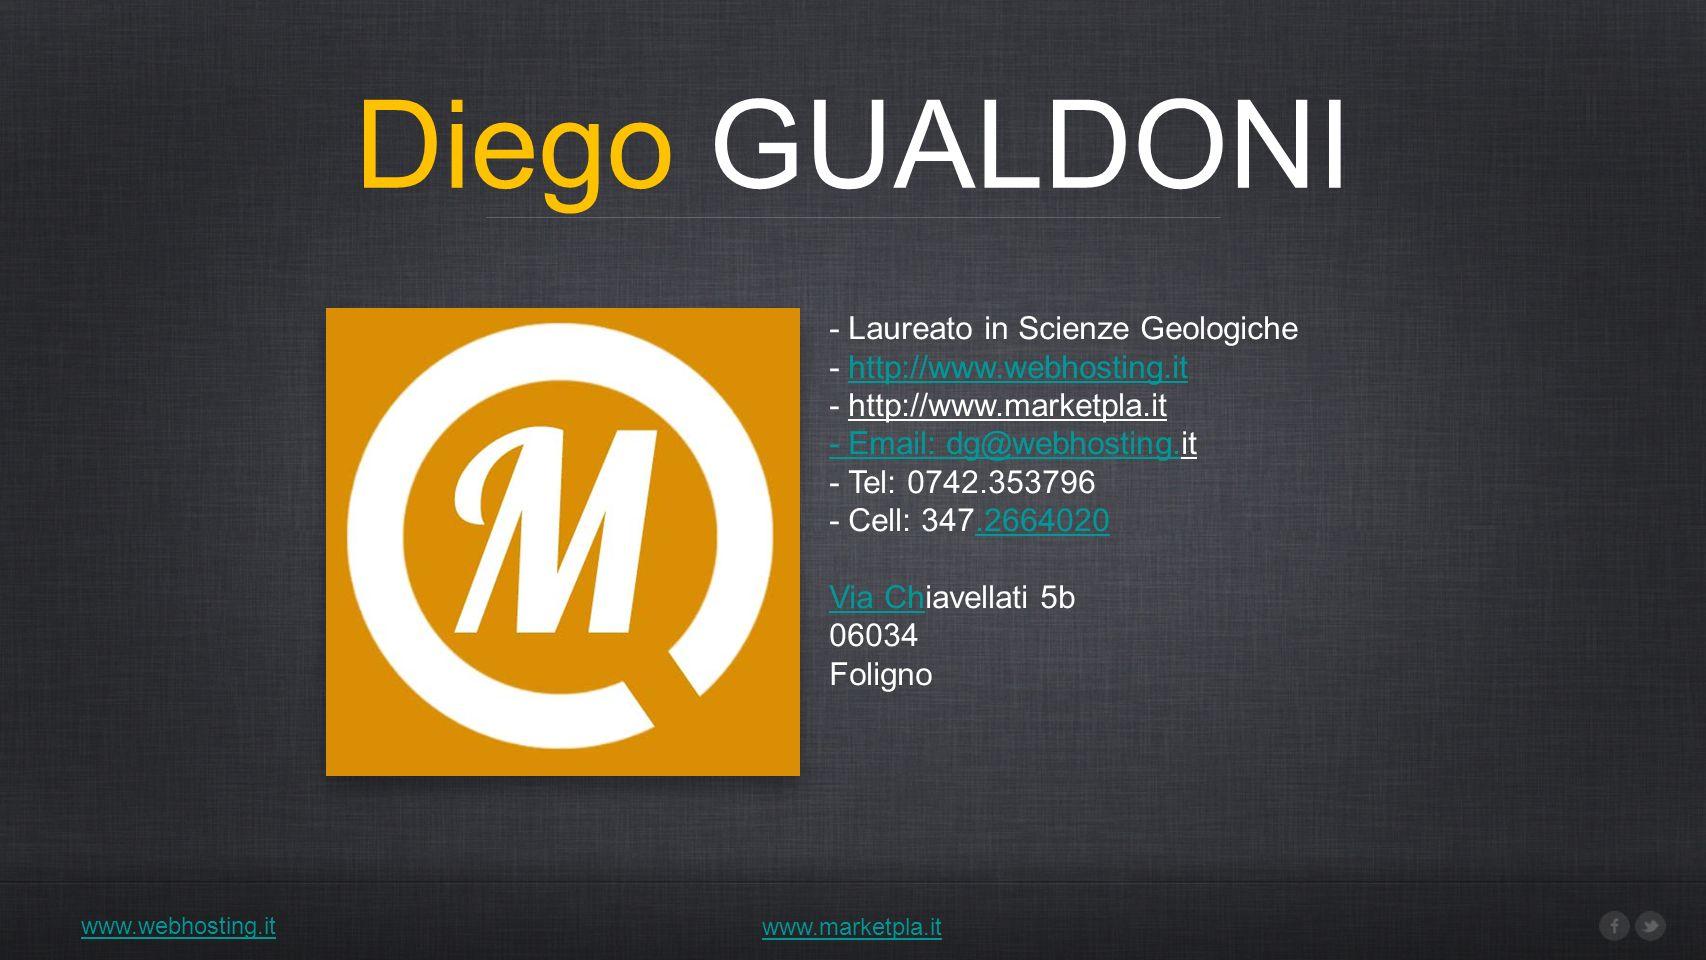 Diego GUALDONI www.webhosting.it www.marketpla.it - Laureato in Scienze Geologiche - http://www.webhosting.ithttp://www.webhosting.it - http://www.marketpla.it - Email: dg@webhosting.- Email: dg@webhosting.it - Tel: 0742.353796 - Cell: 347.2664020.2664020 Via ChVia Chiavellati 5b 06034 Foligno